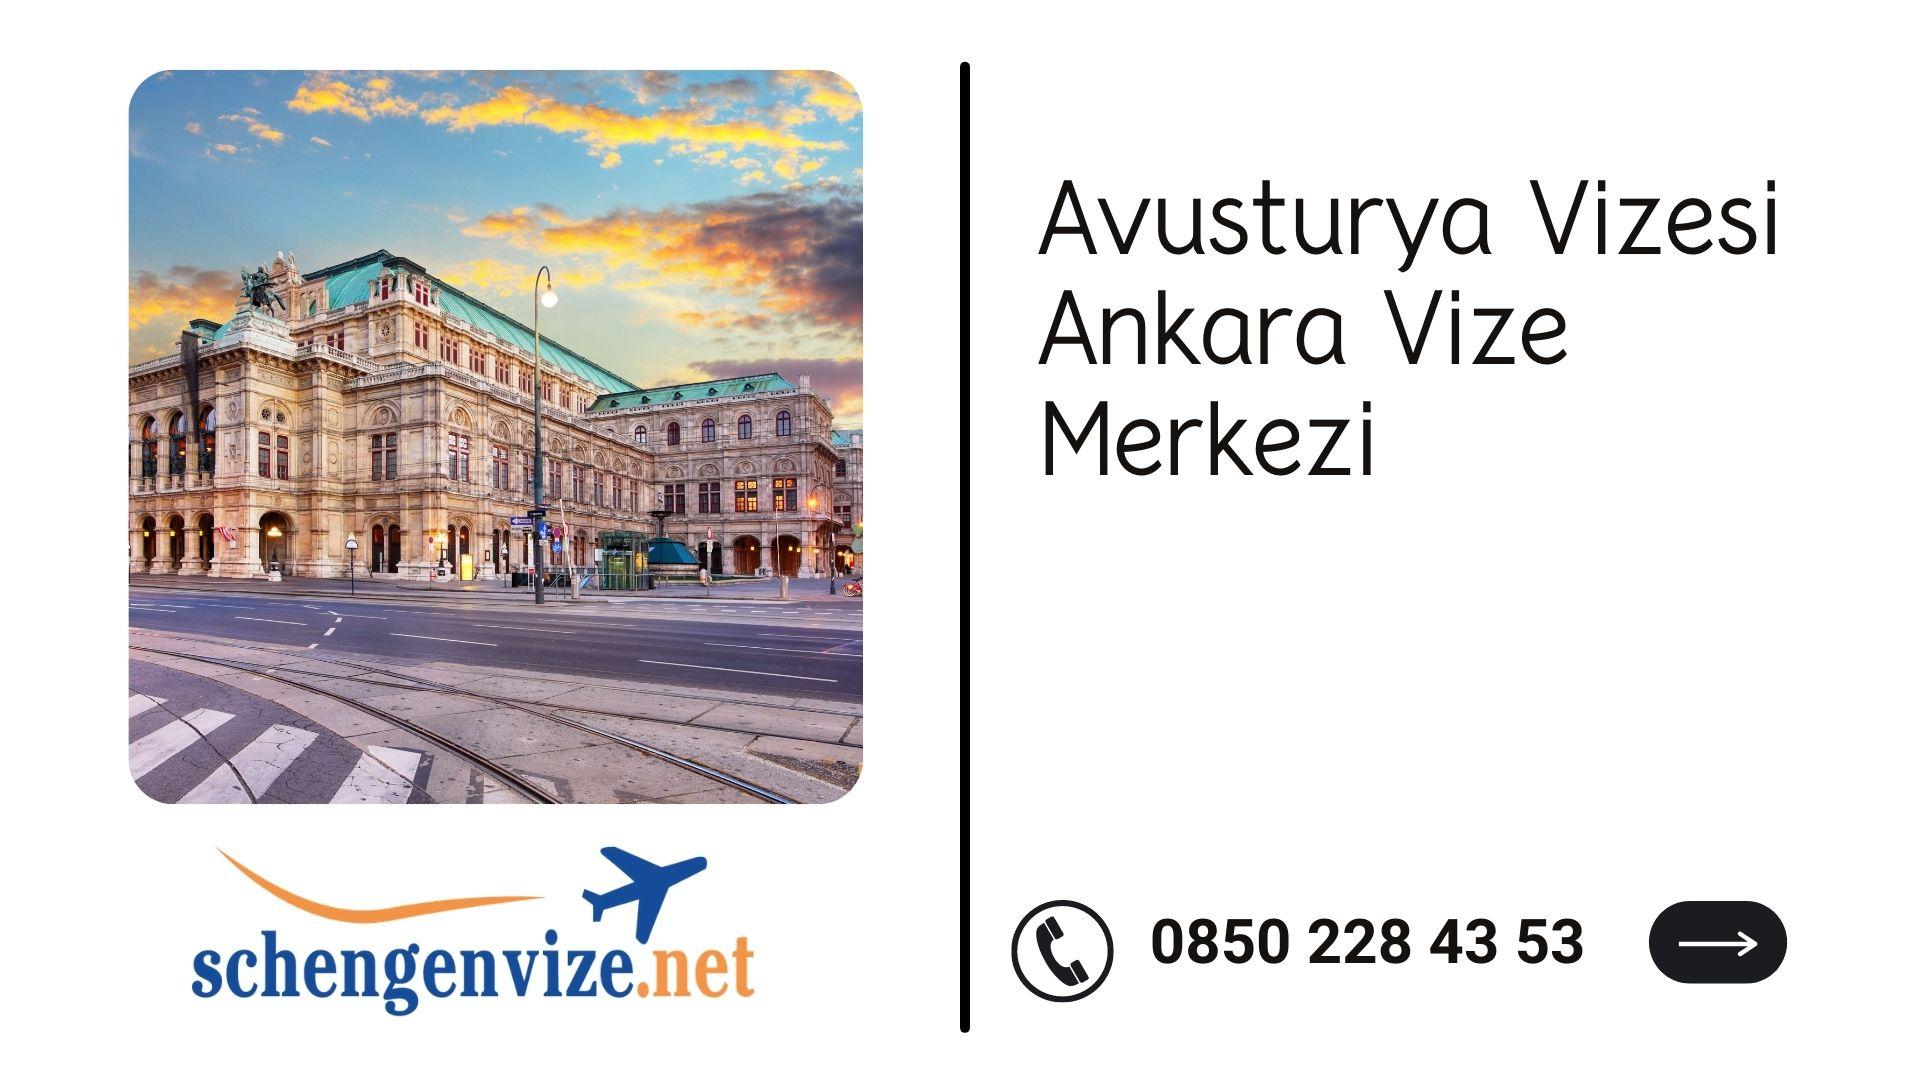 Avusturya Vizesi Ankara Vize Merkezi